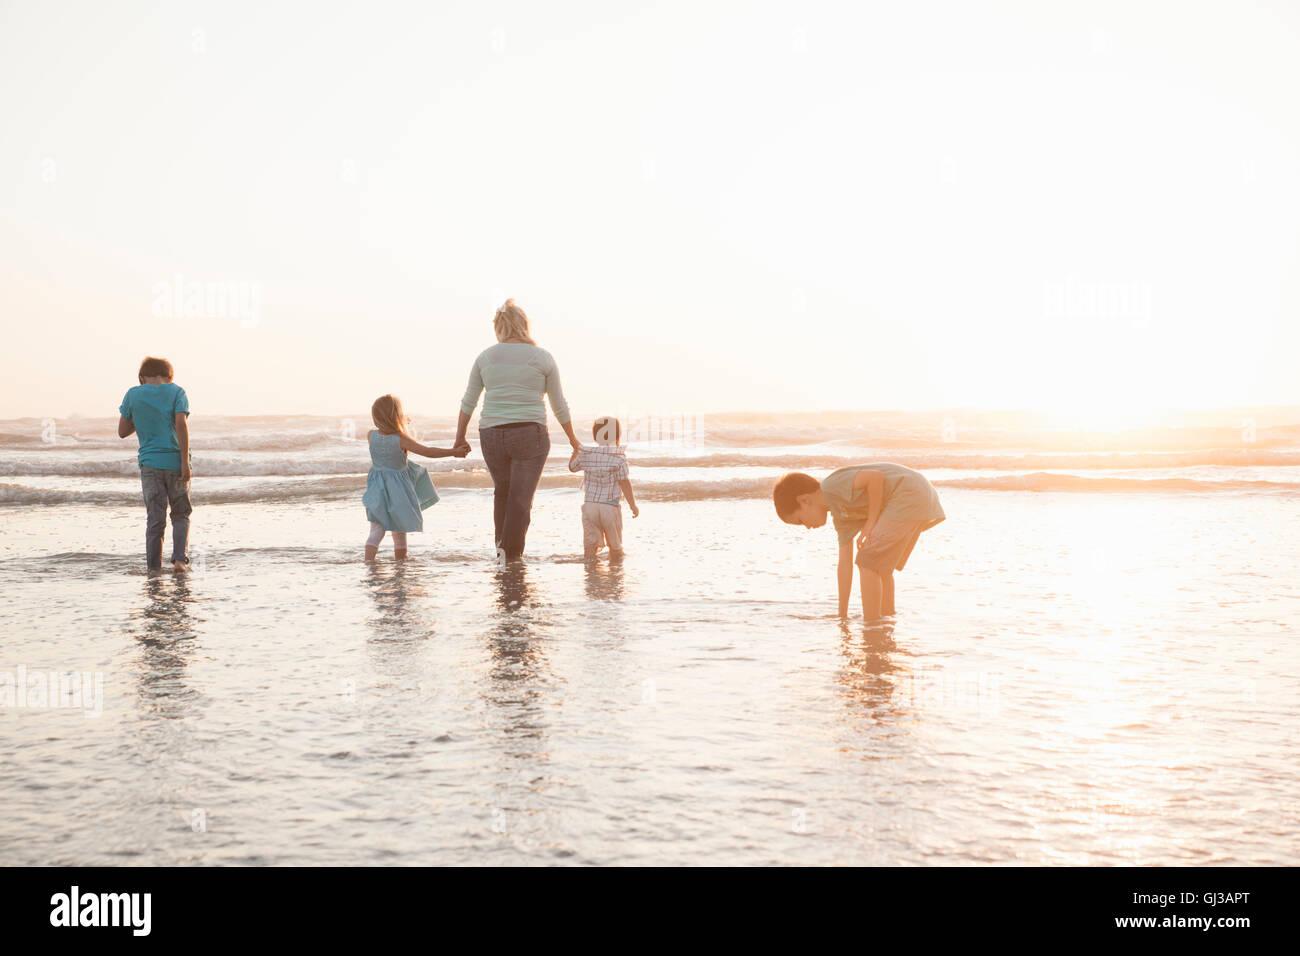 Family holding hands paddling in ocean - Stock Image